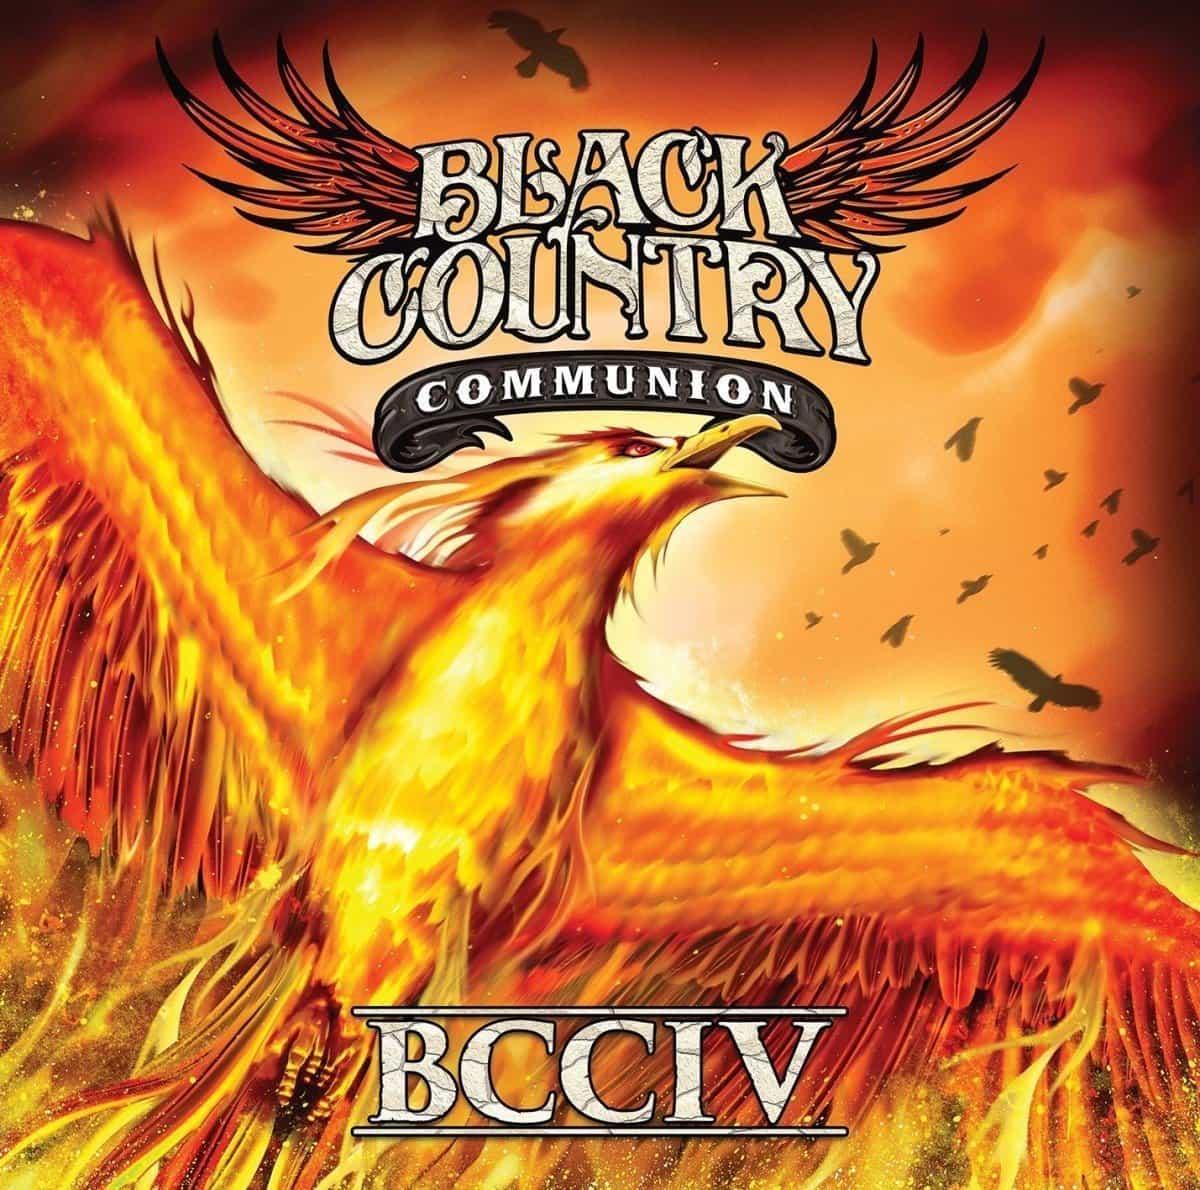 Black-Country-Communion-BCCIV